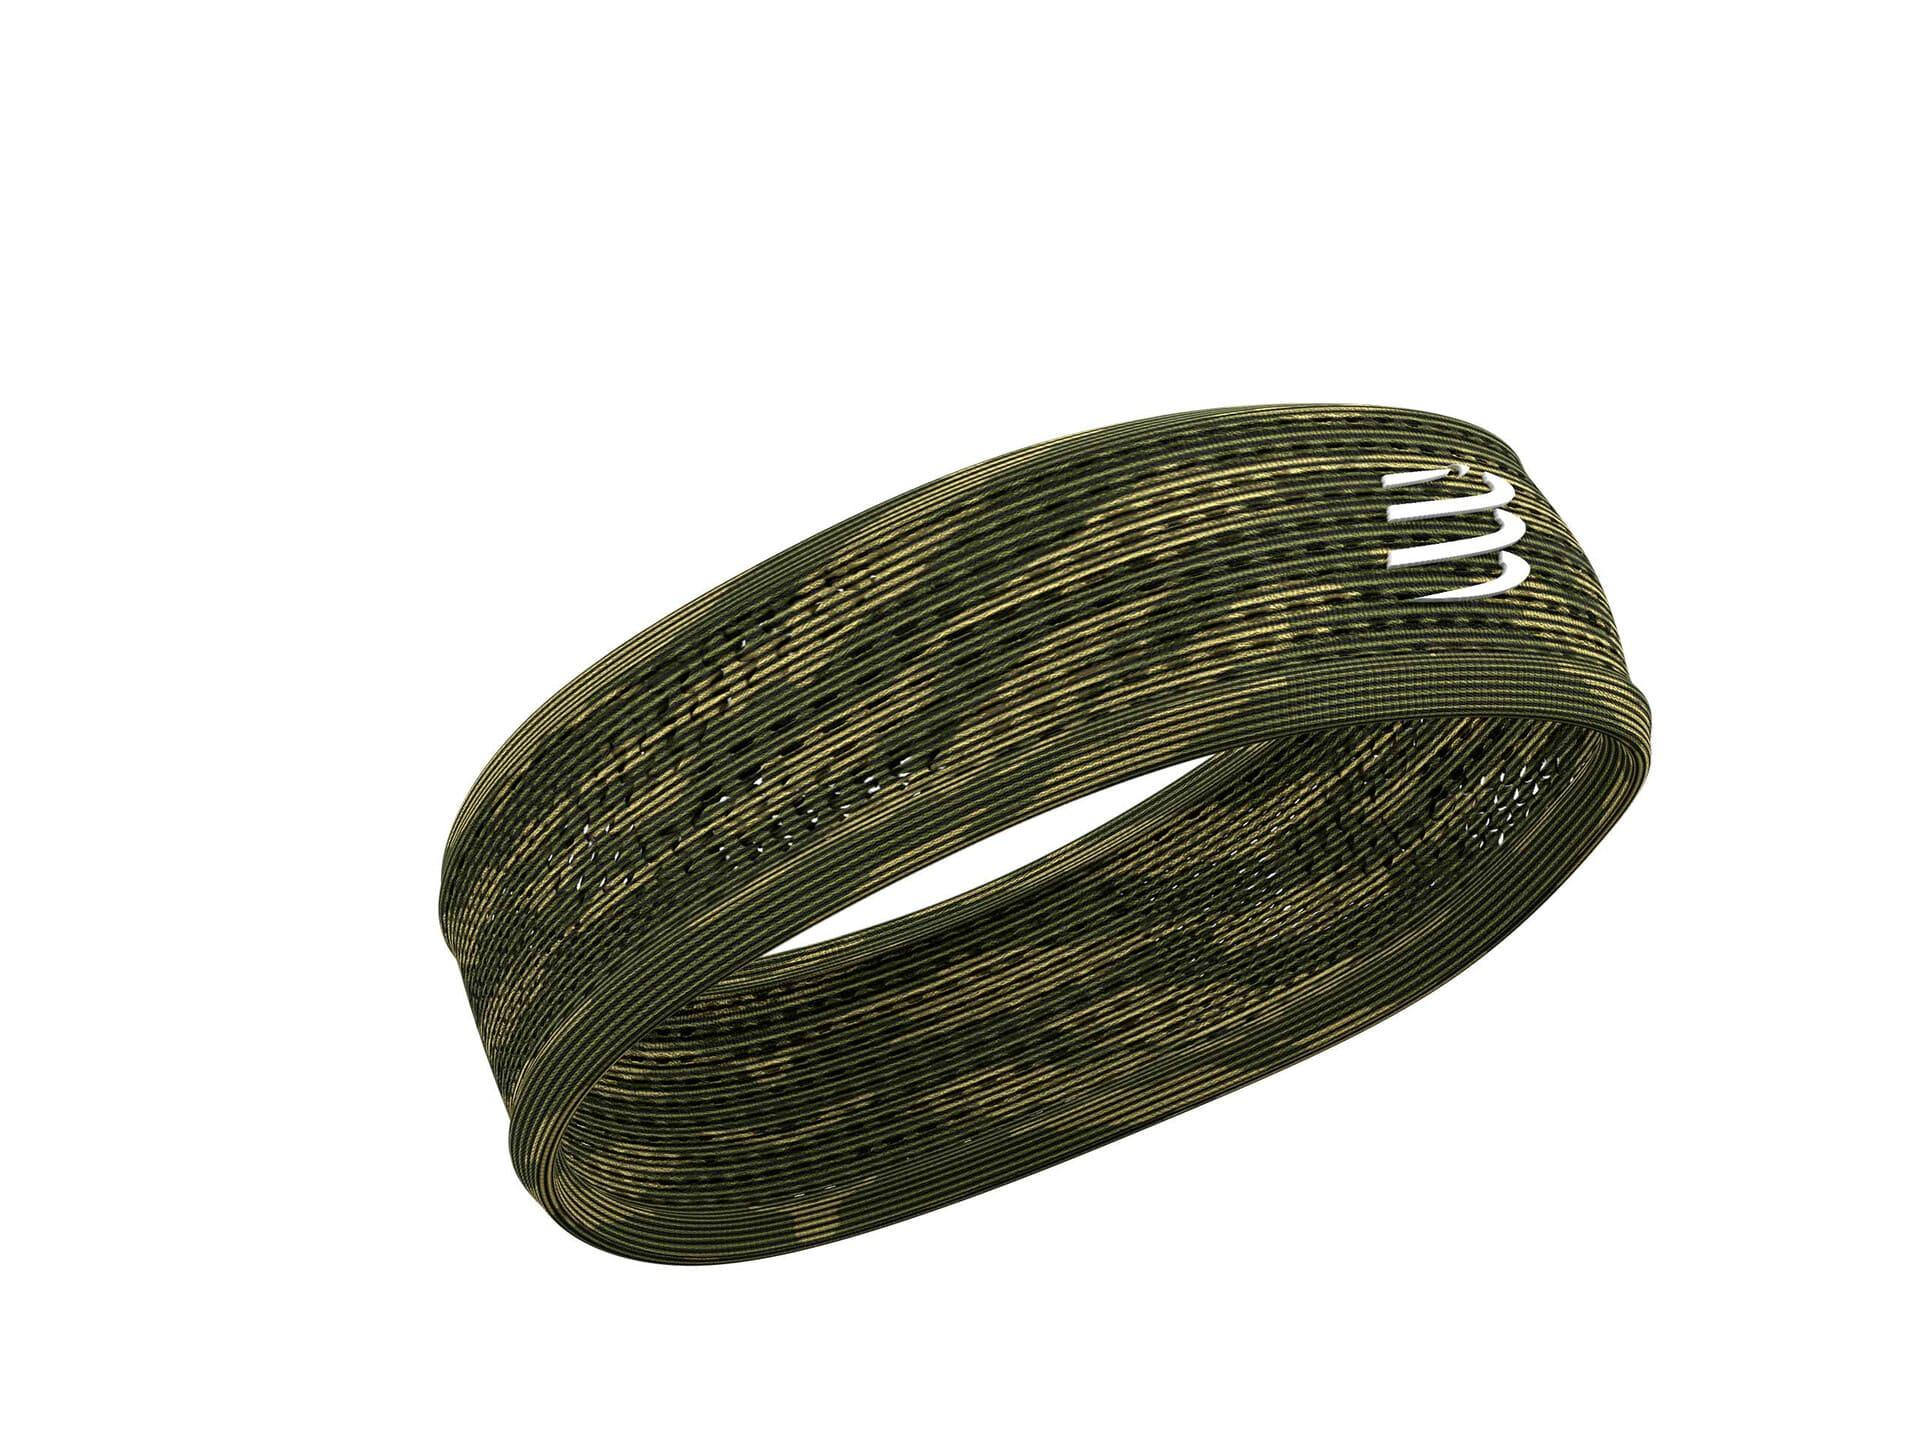 Faixa de Cabeça Fina ON/OFF (Thin Headband) Unissex Compressport